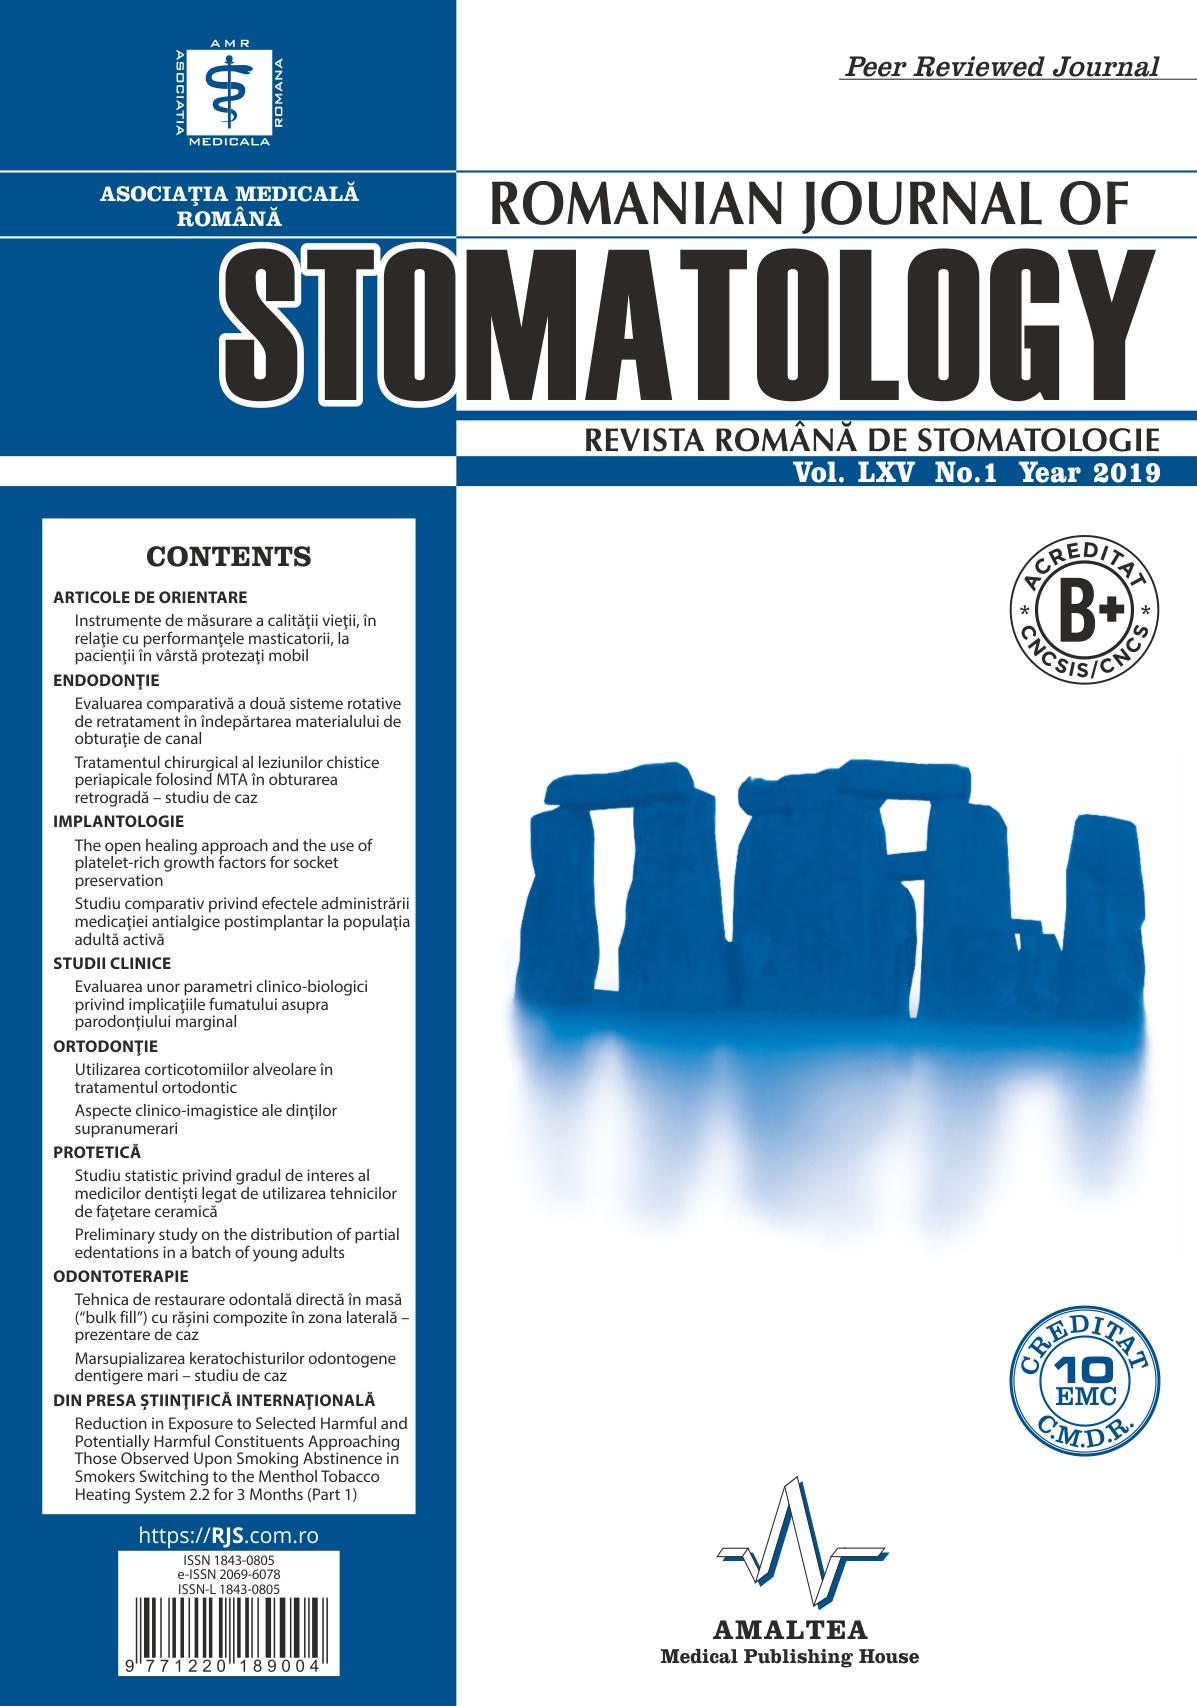 Revista Romana de STOMATOLOGIE - Romanian Journal of Stomatology, Vol. LXV, Nr. 1, An 2019